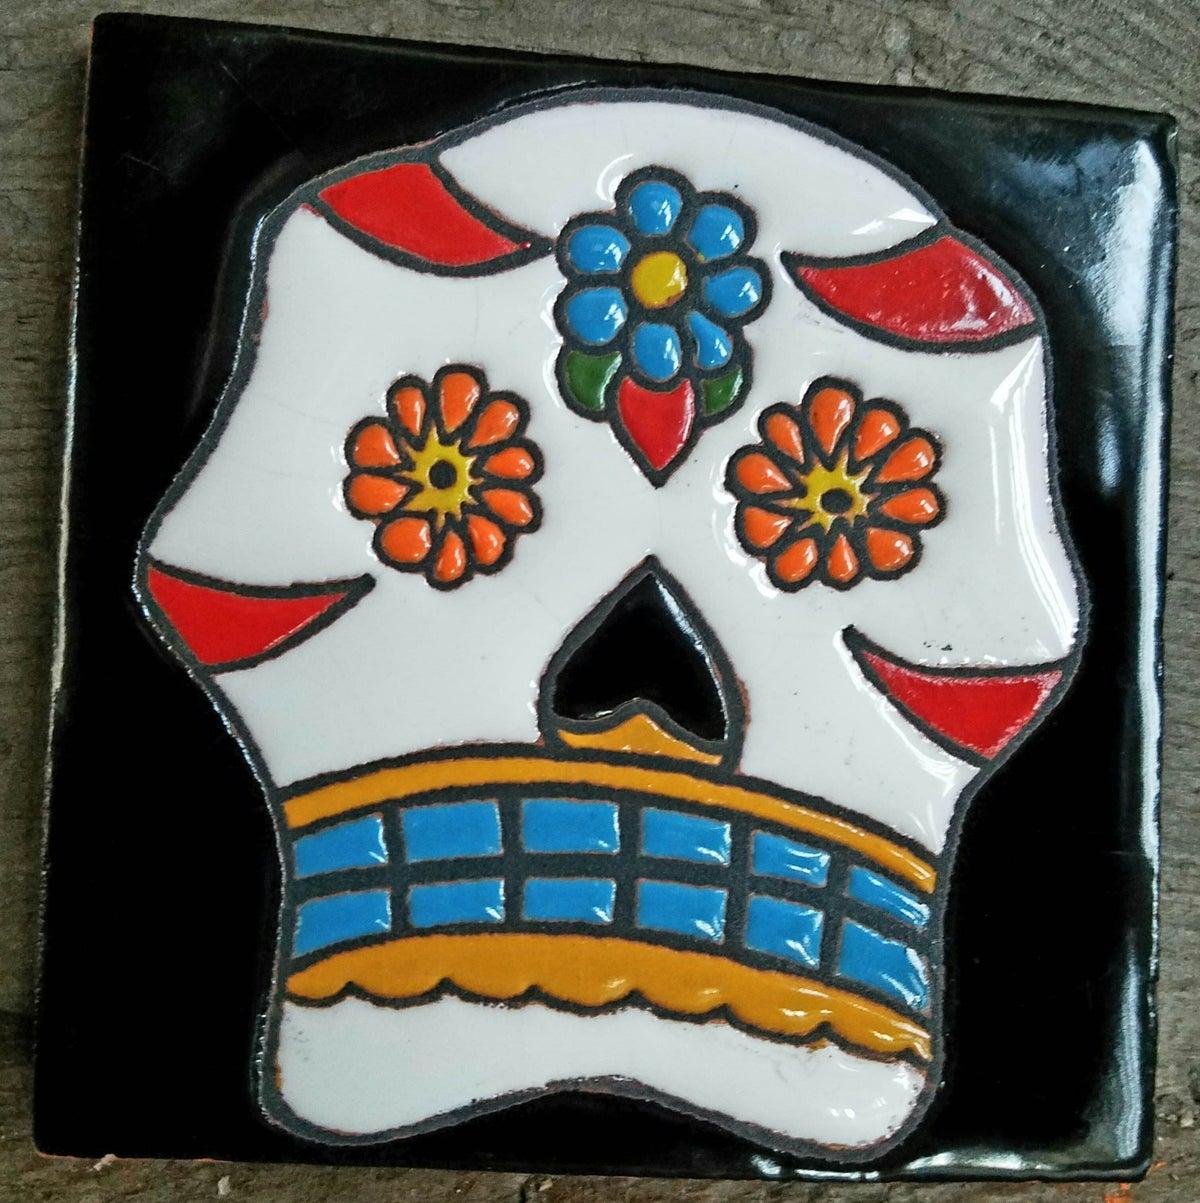 Image of Sugar Skull Coaster Tile